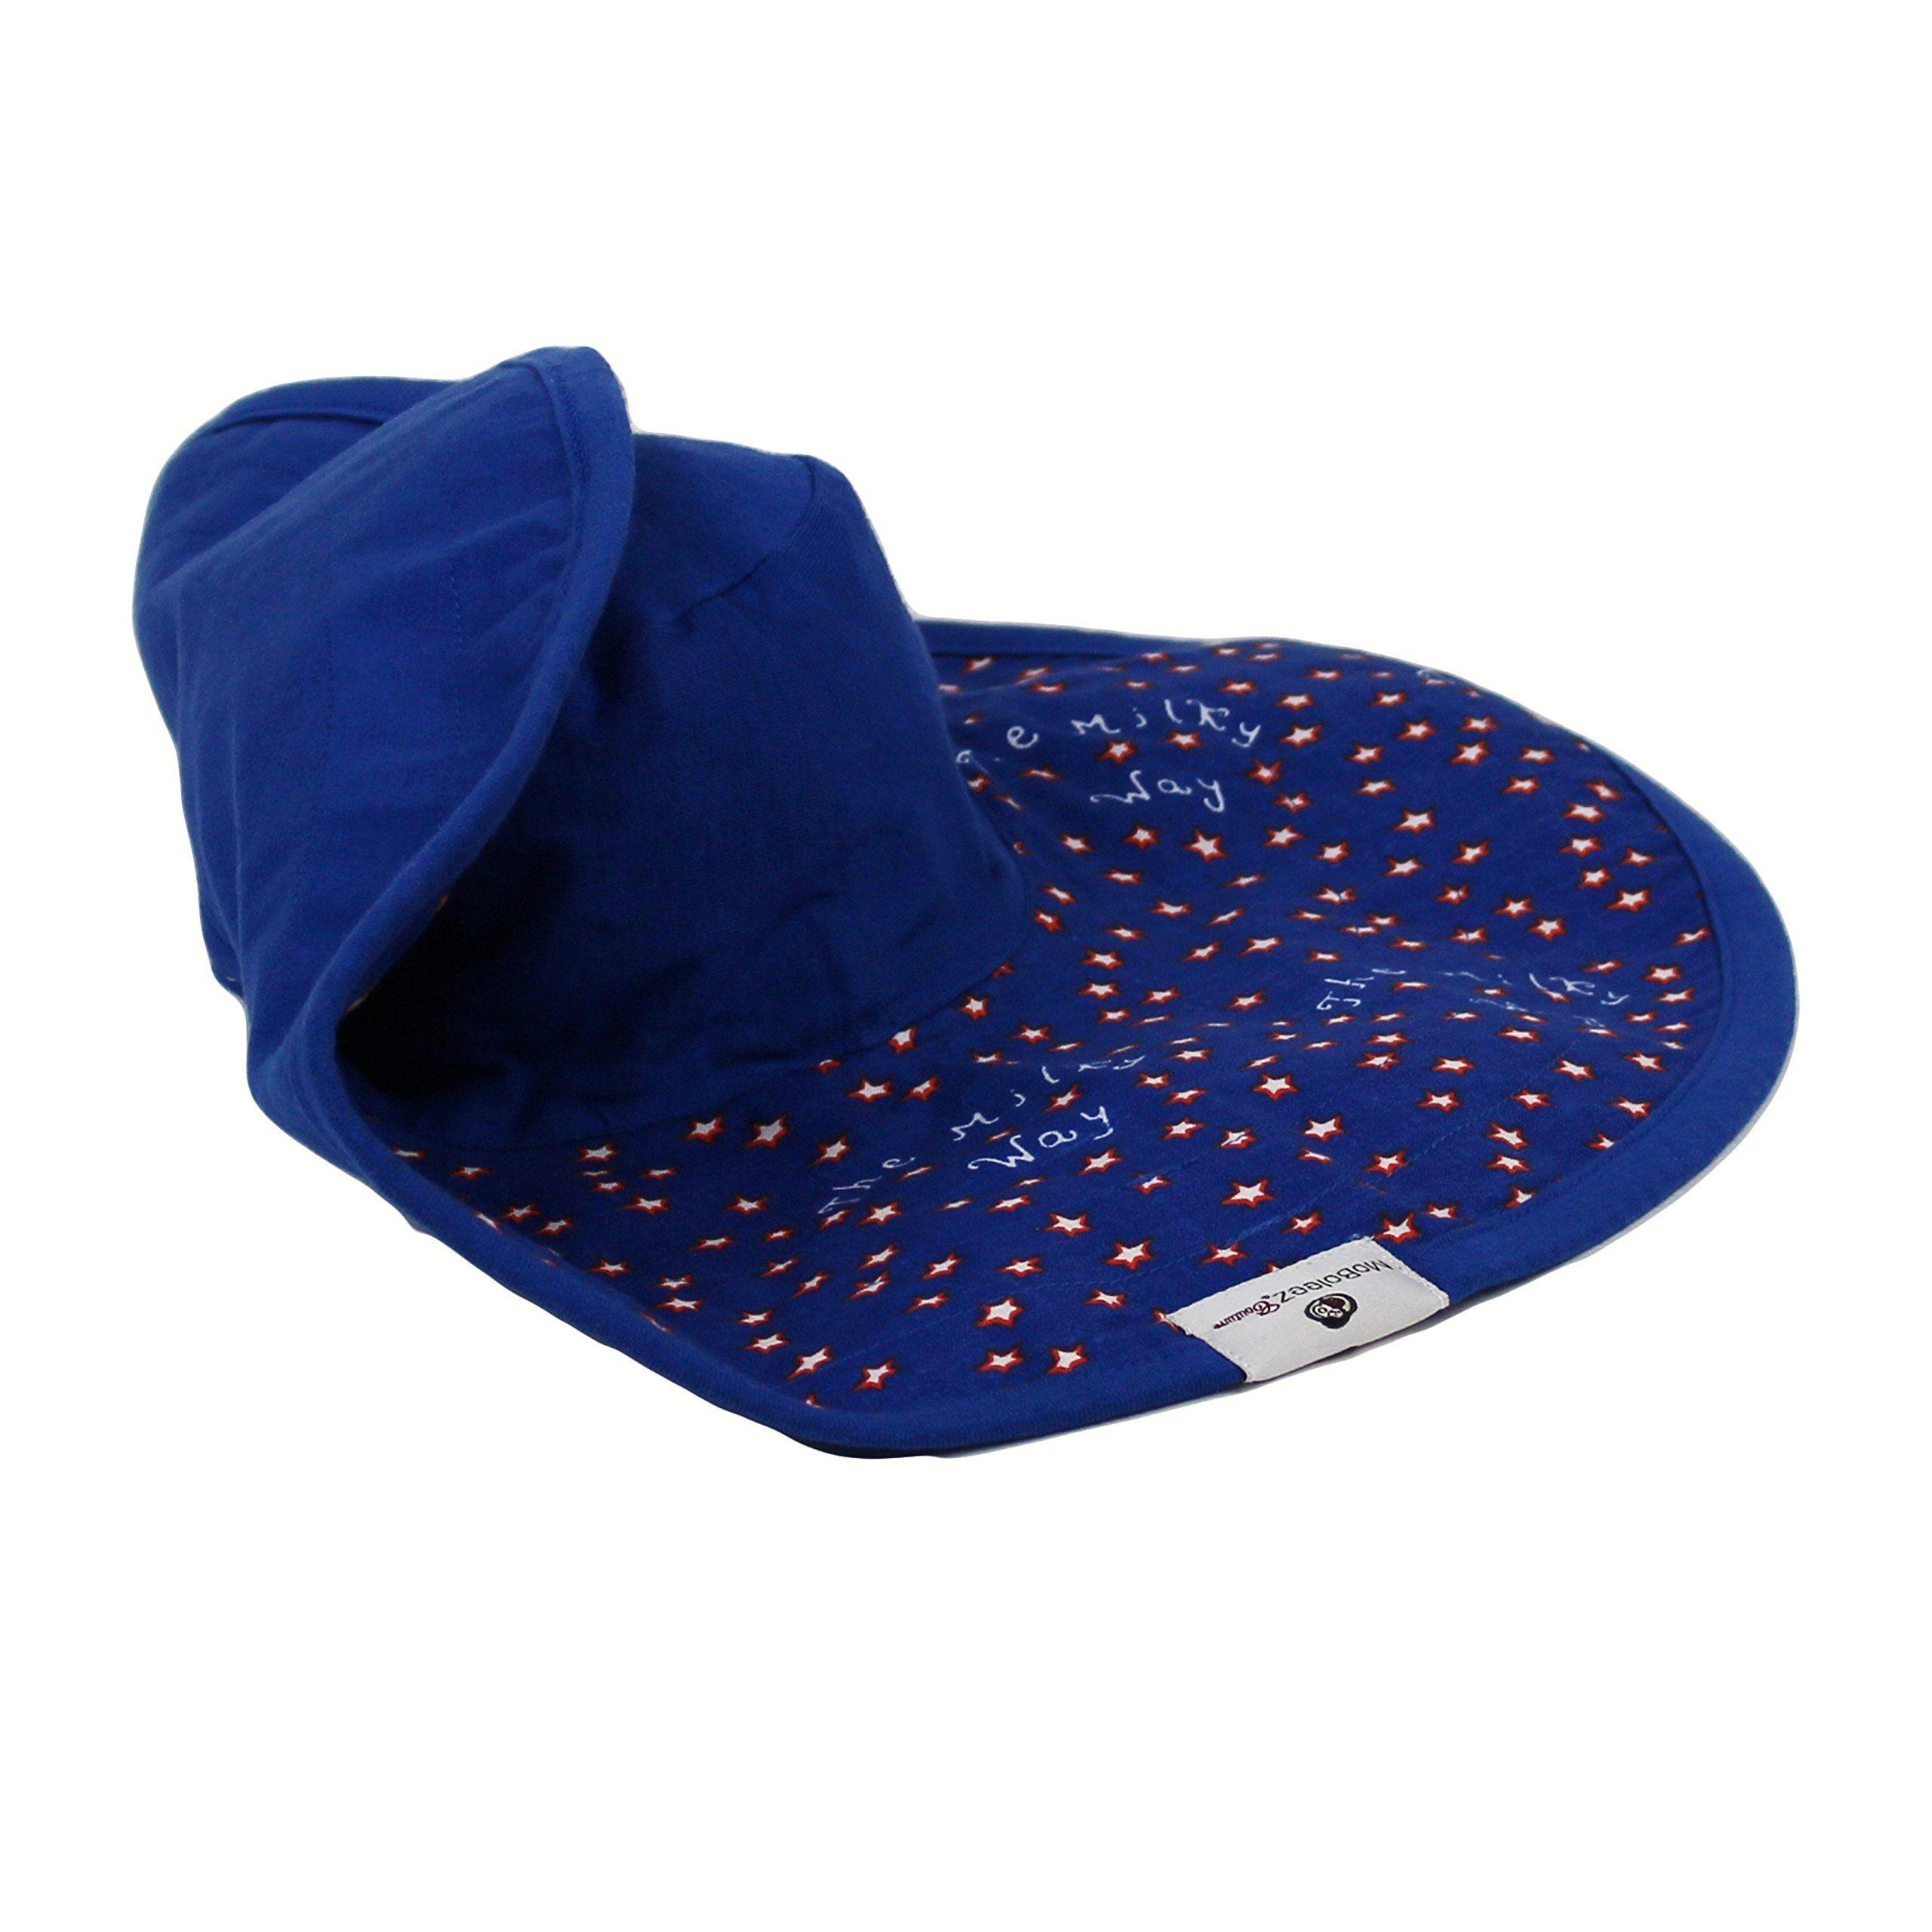 MOBOLEEZ BREASTFEEDING HAT NURSING COVER